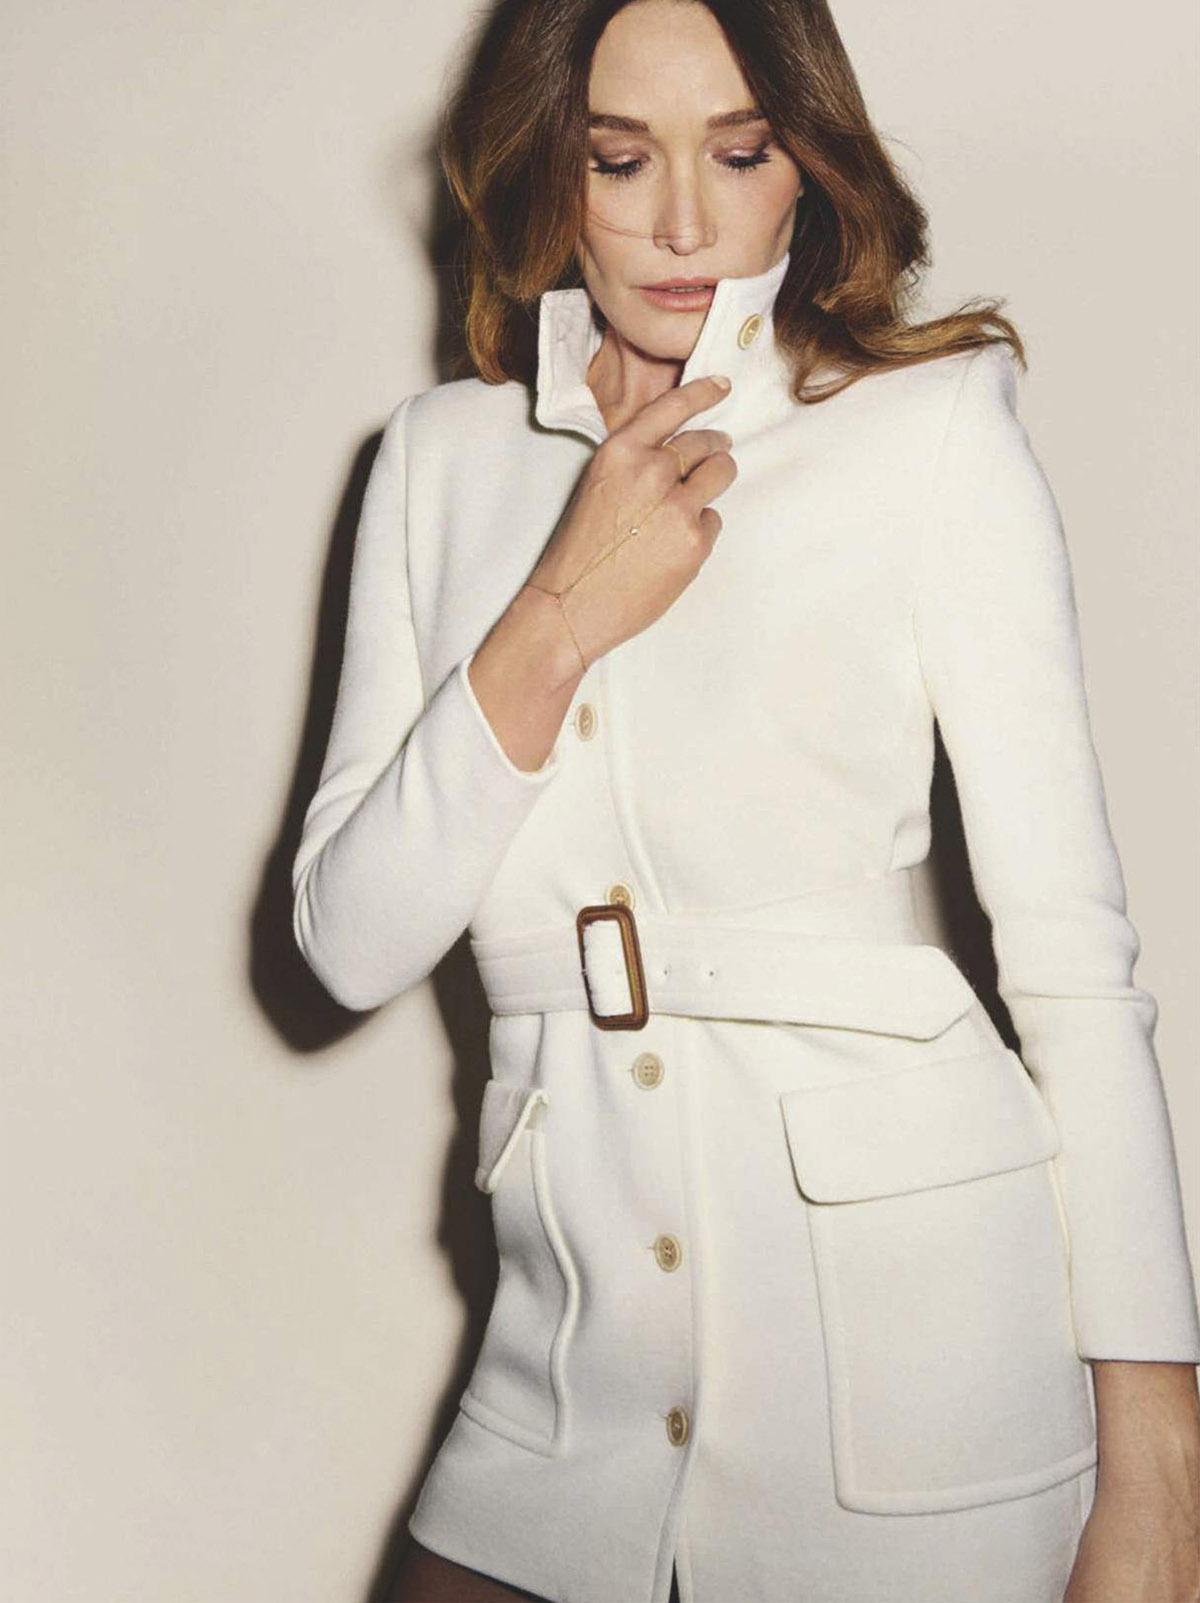 Carla Bruni covers Vanity Fair Spain April 2021 by Ezra Petronio